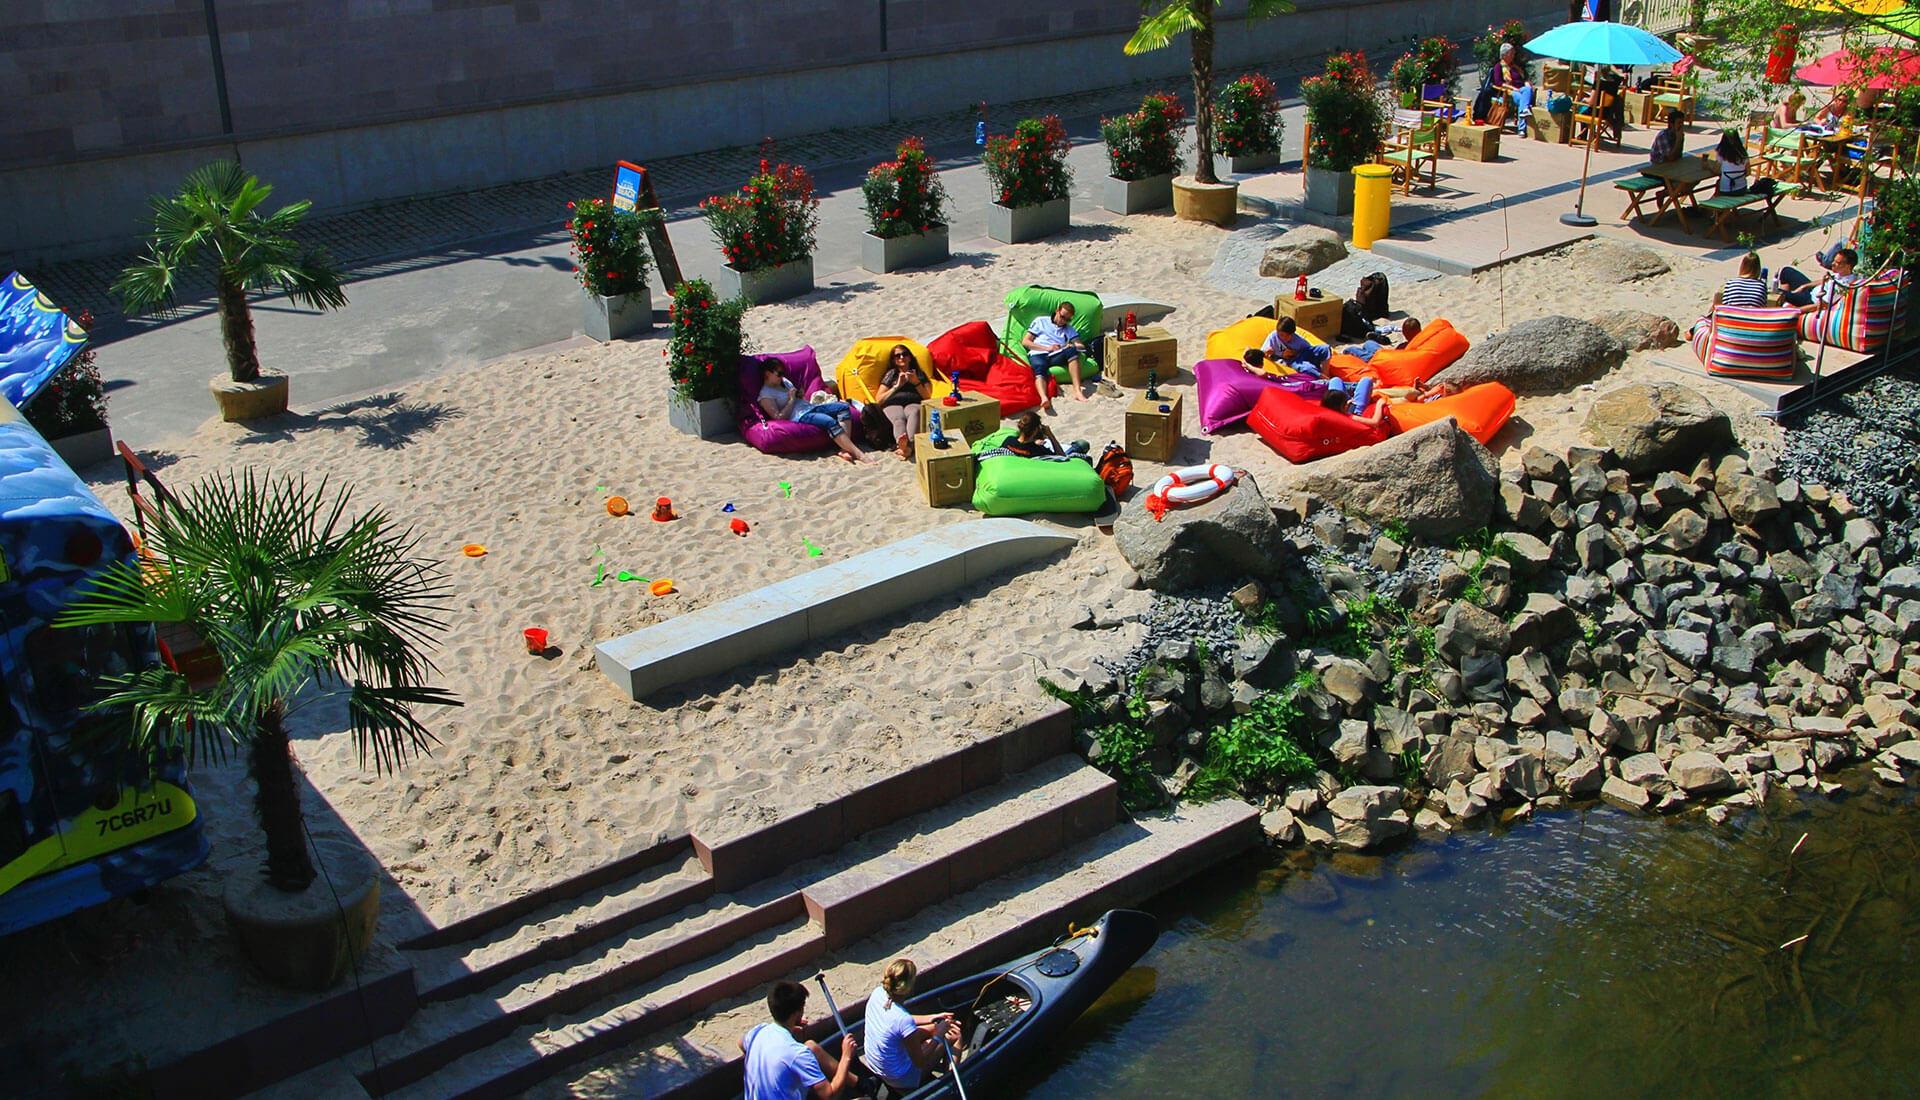 Aroma Lahn Beach - Stadtstrand in Marburg